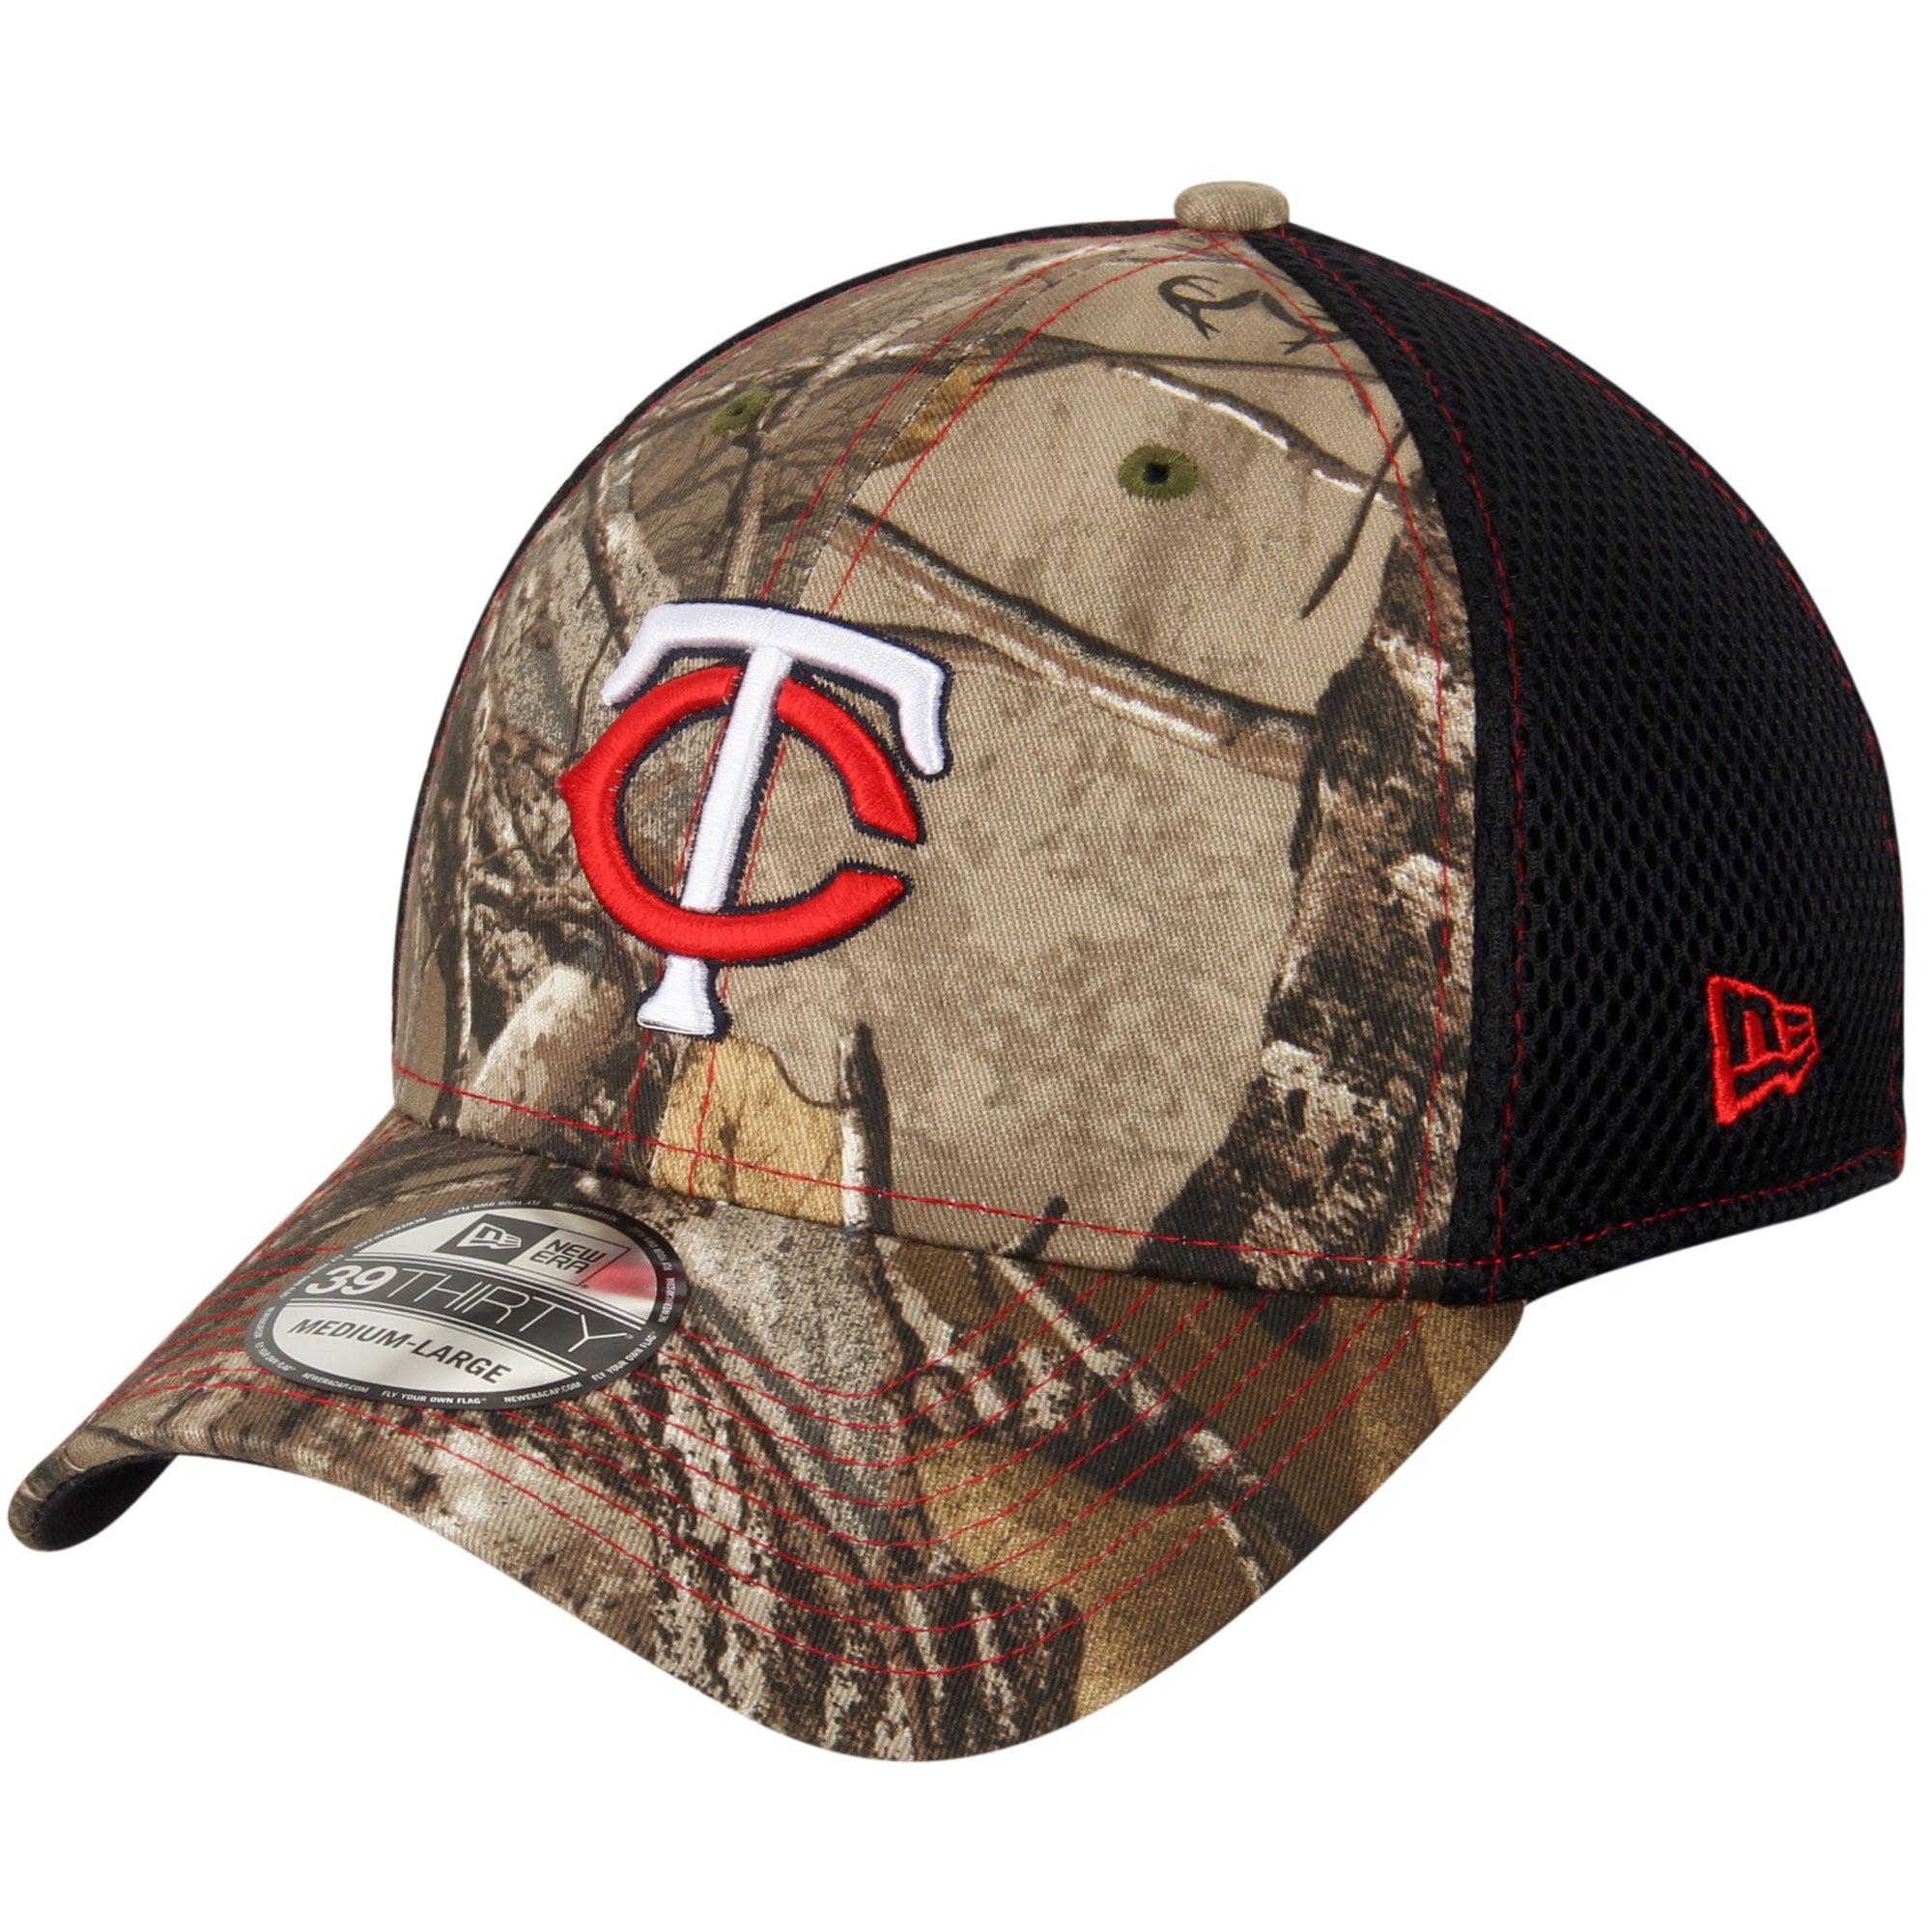 online retailer 21dba 1004f ... where can i buy minnesota twins new era neo 39thirty flex hat realtree  camo dda77 6cc2e